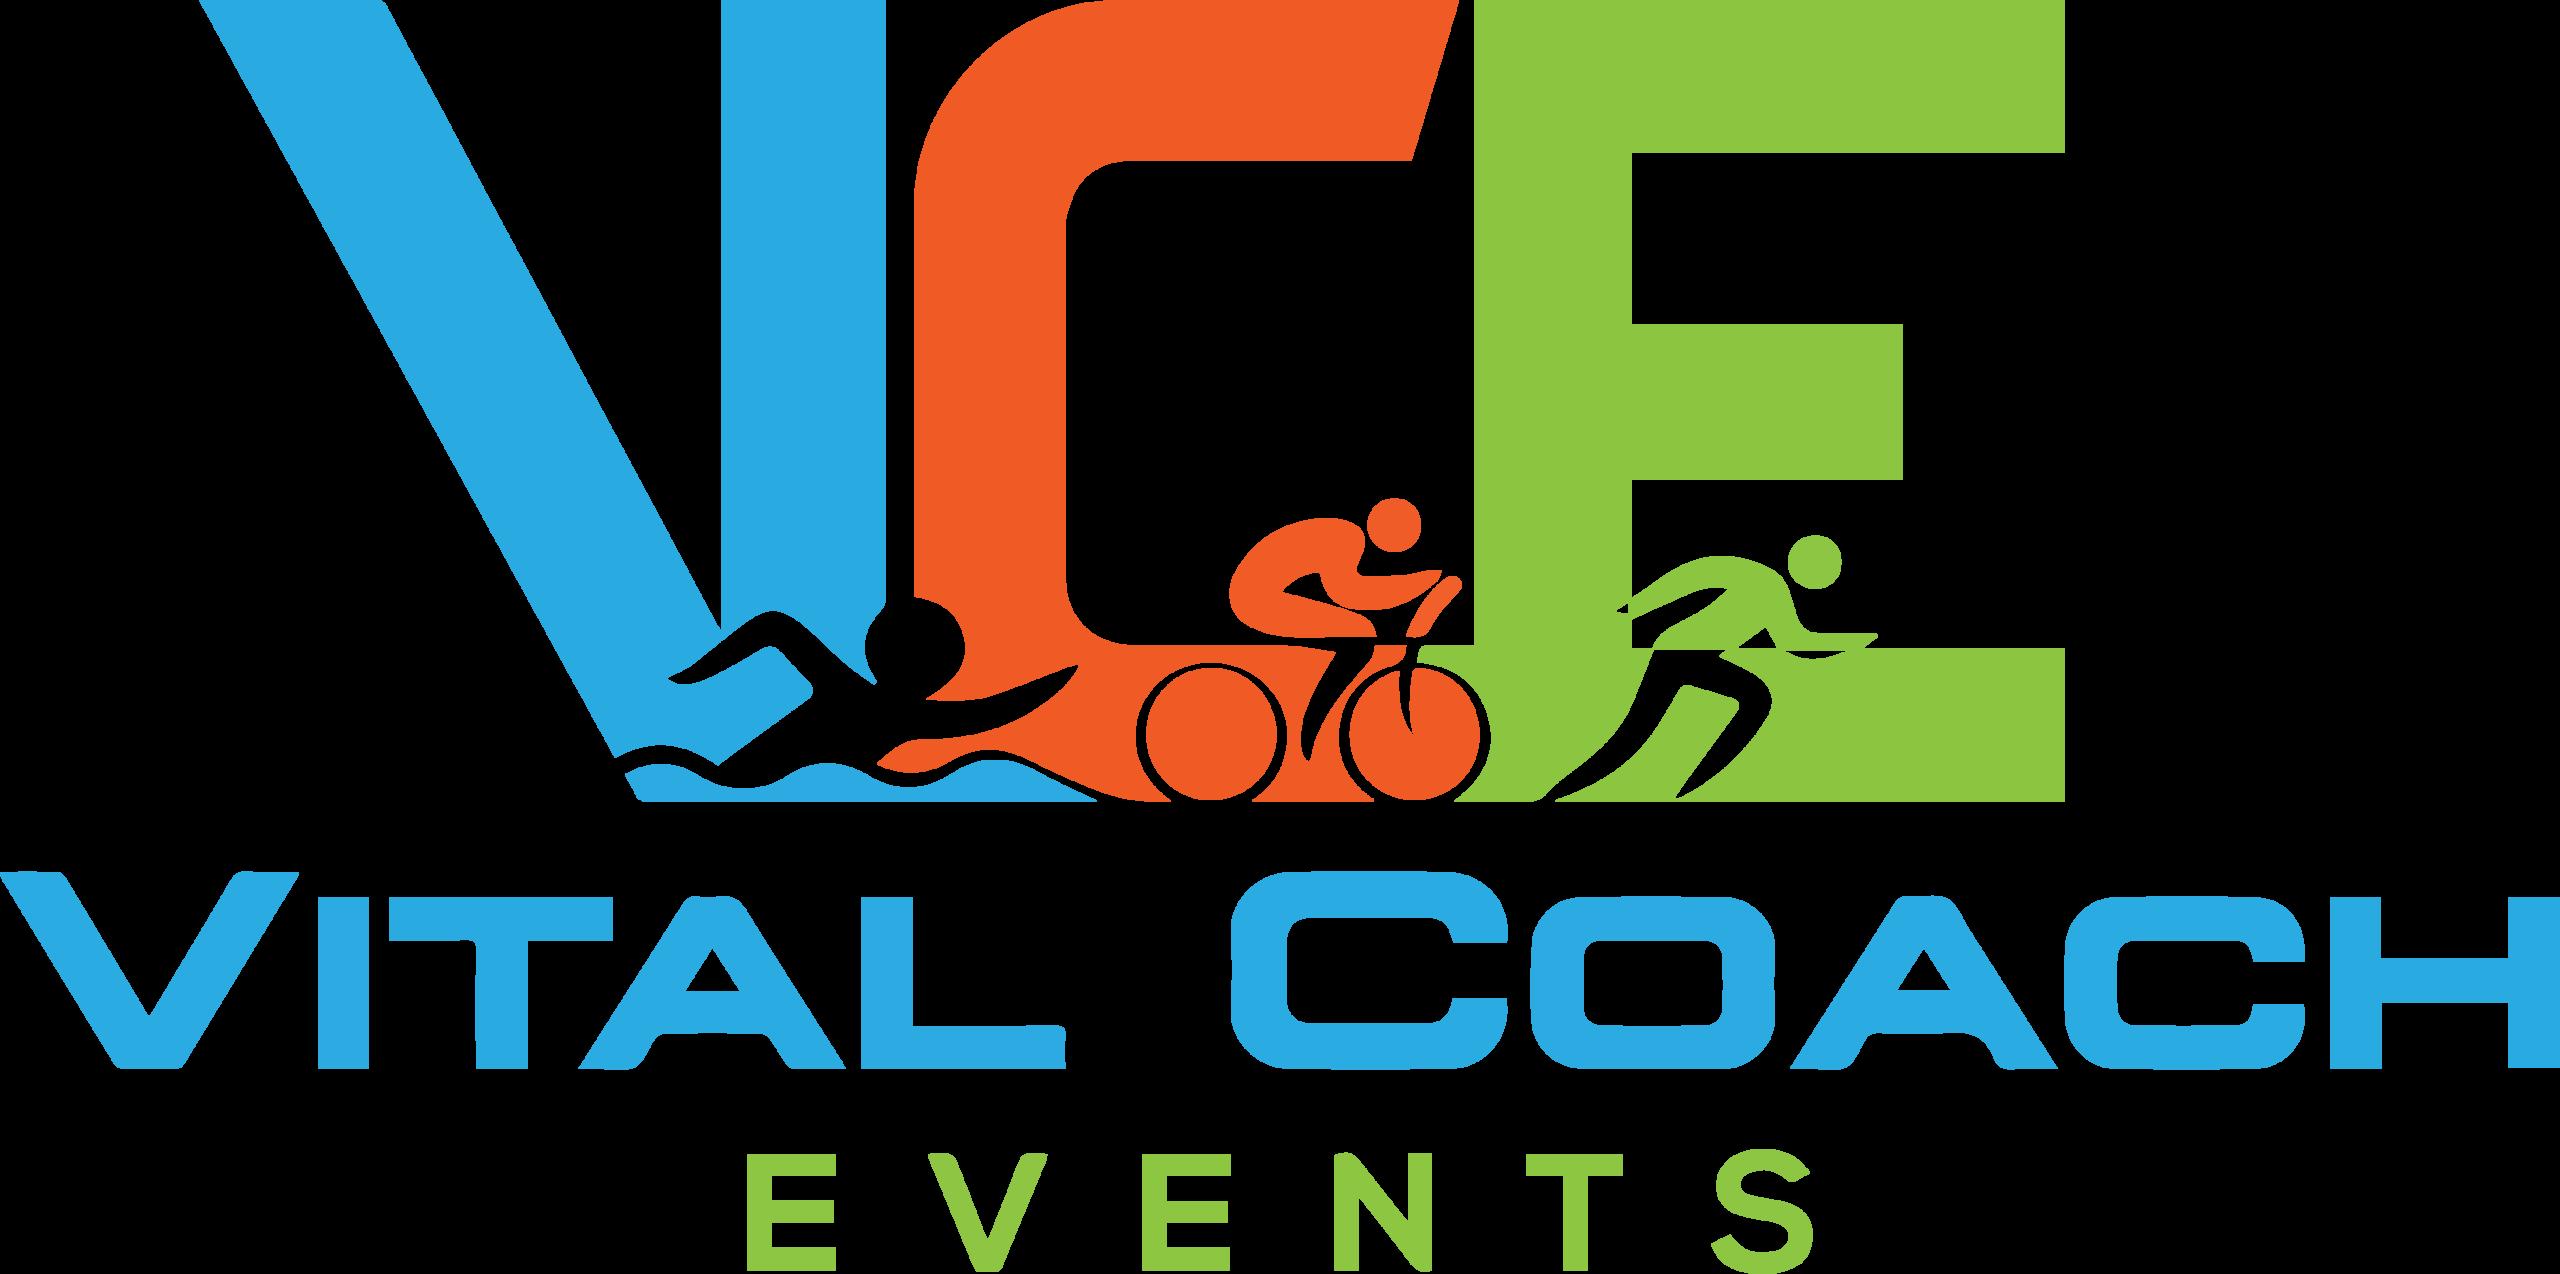 Vital Coach Events